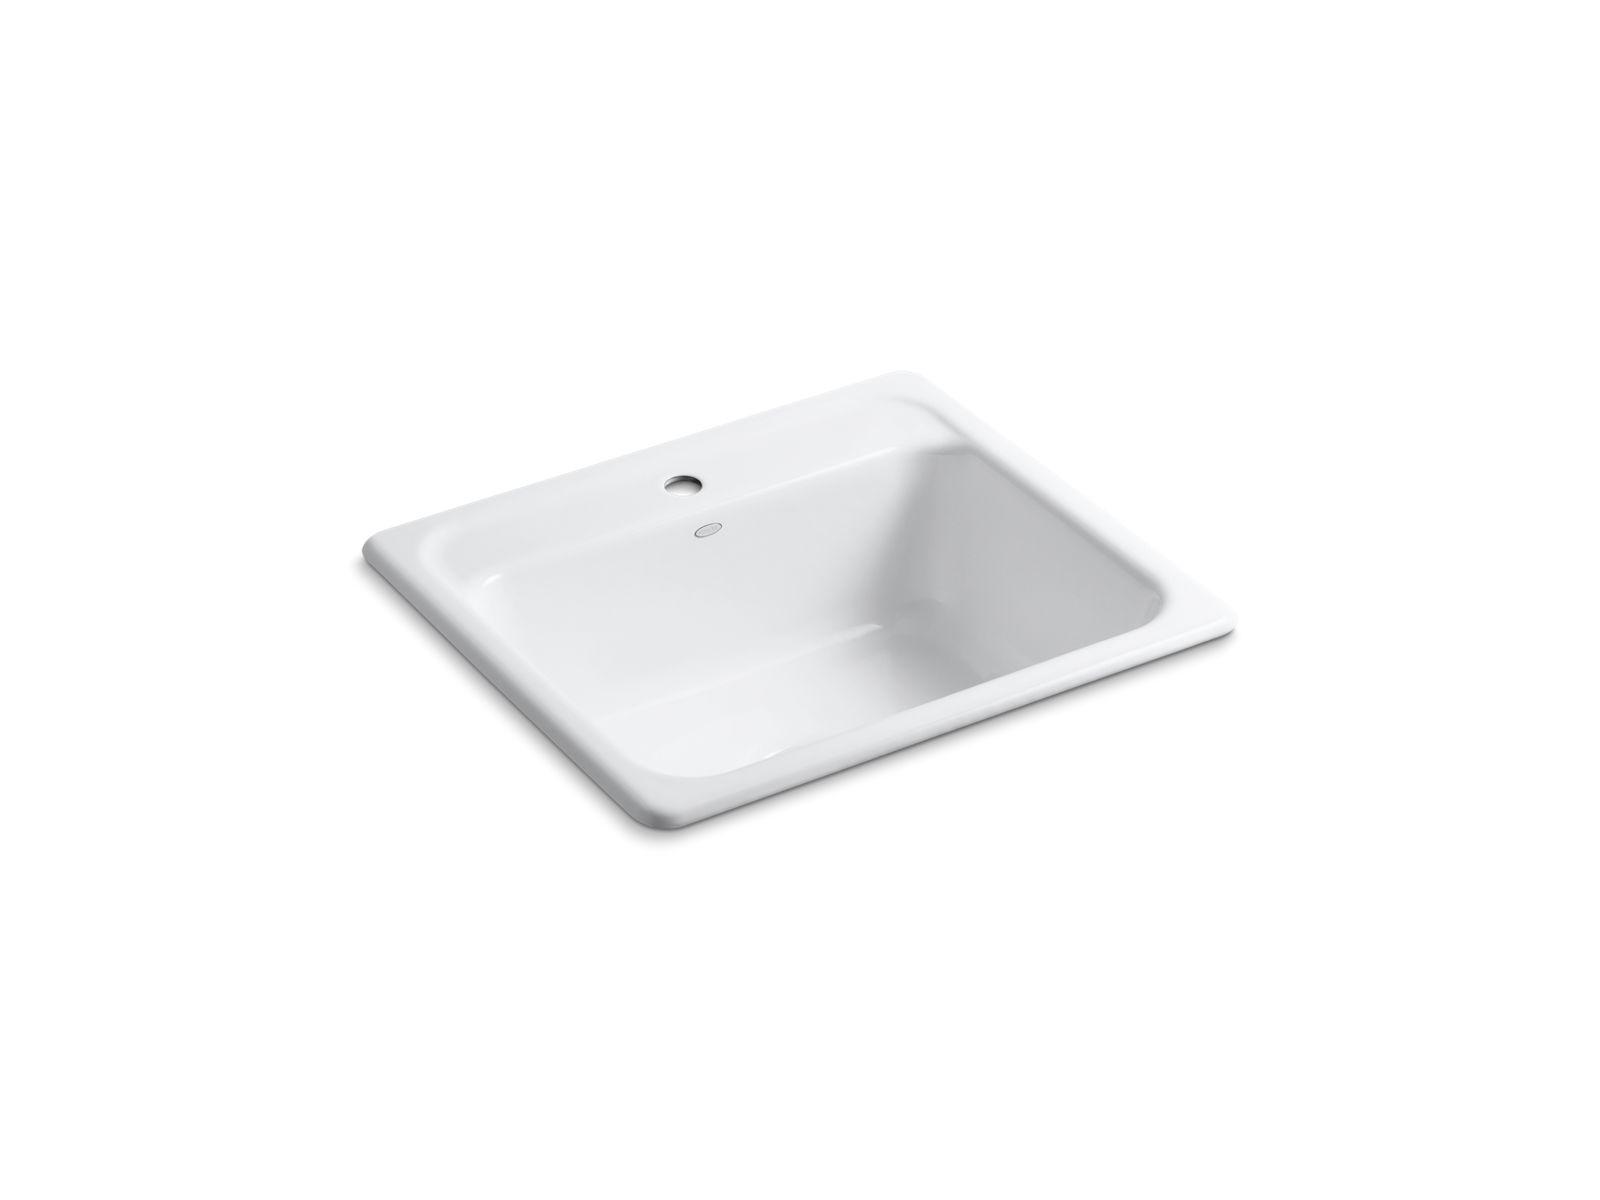 k 5964 1 mayfield top mount kitchen sink with single faucet hole rh us kohler com